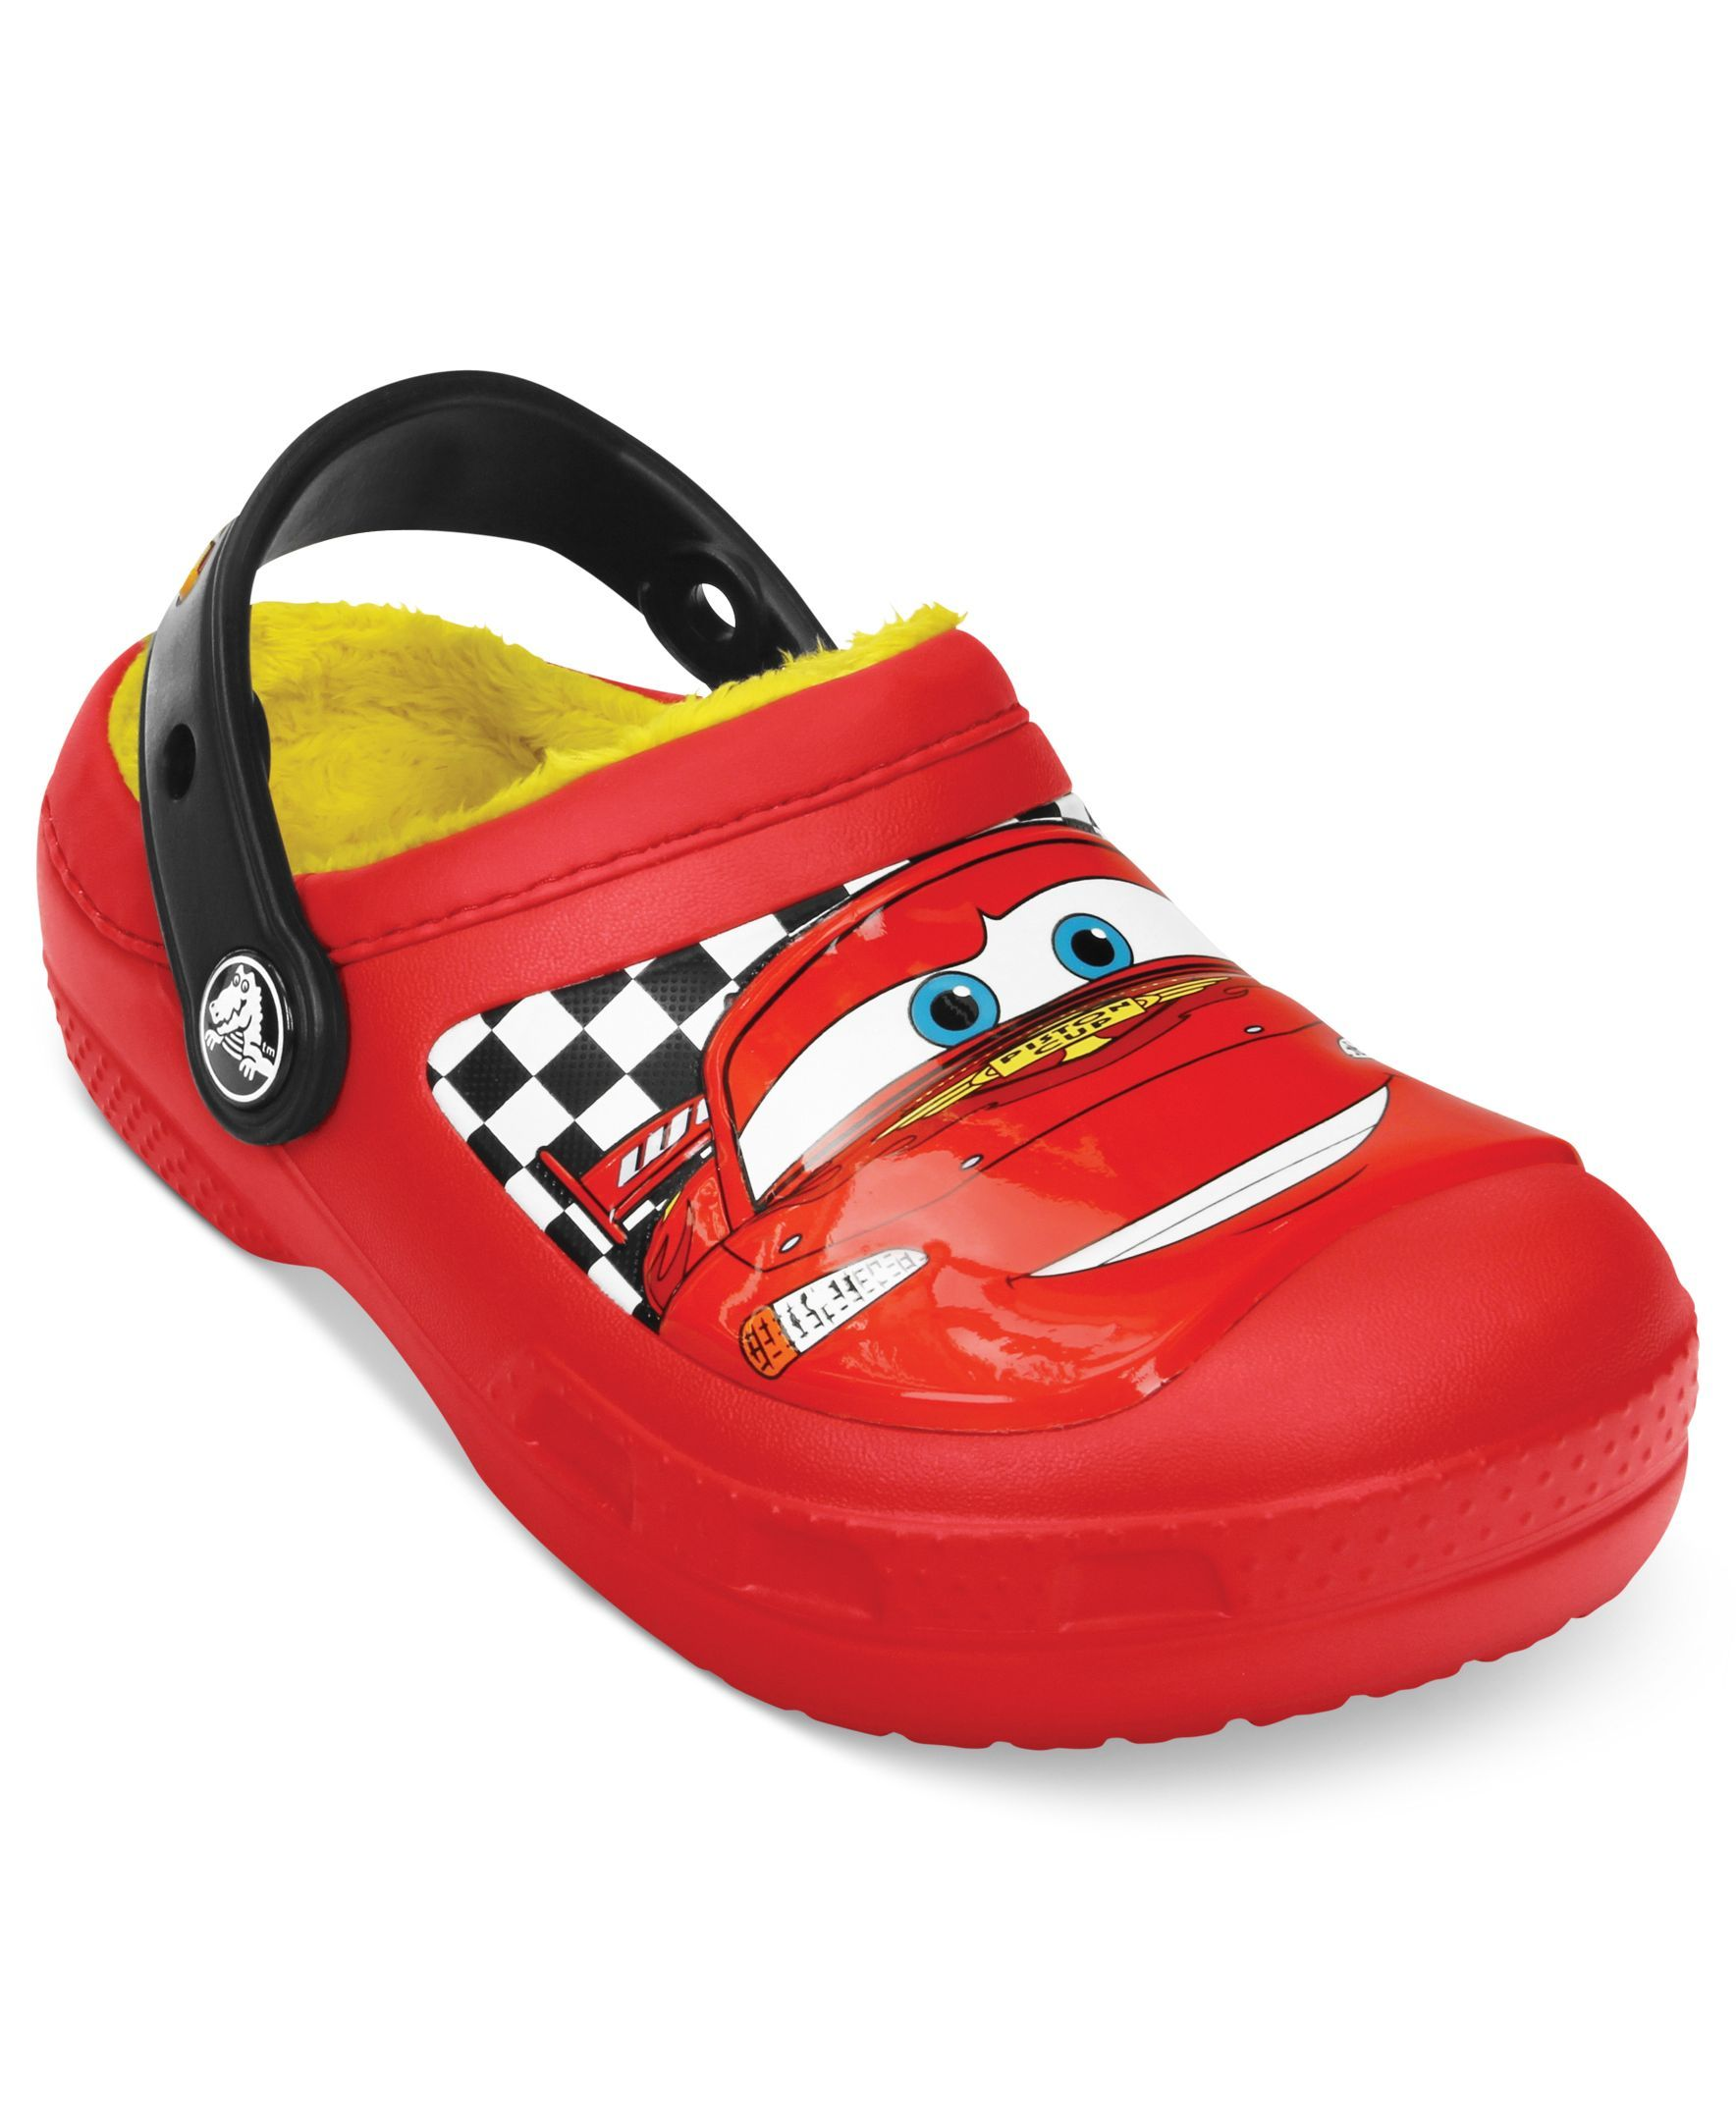 e83a3f0daac7 Crocs Kids Shoes